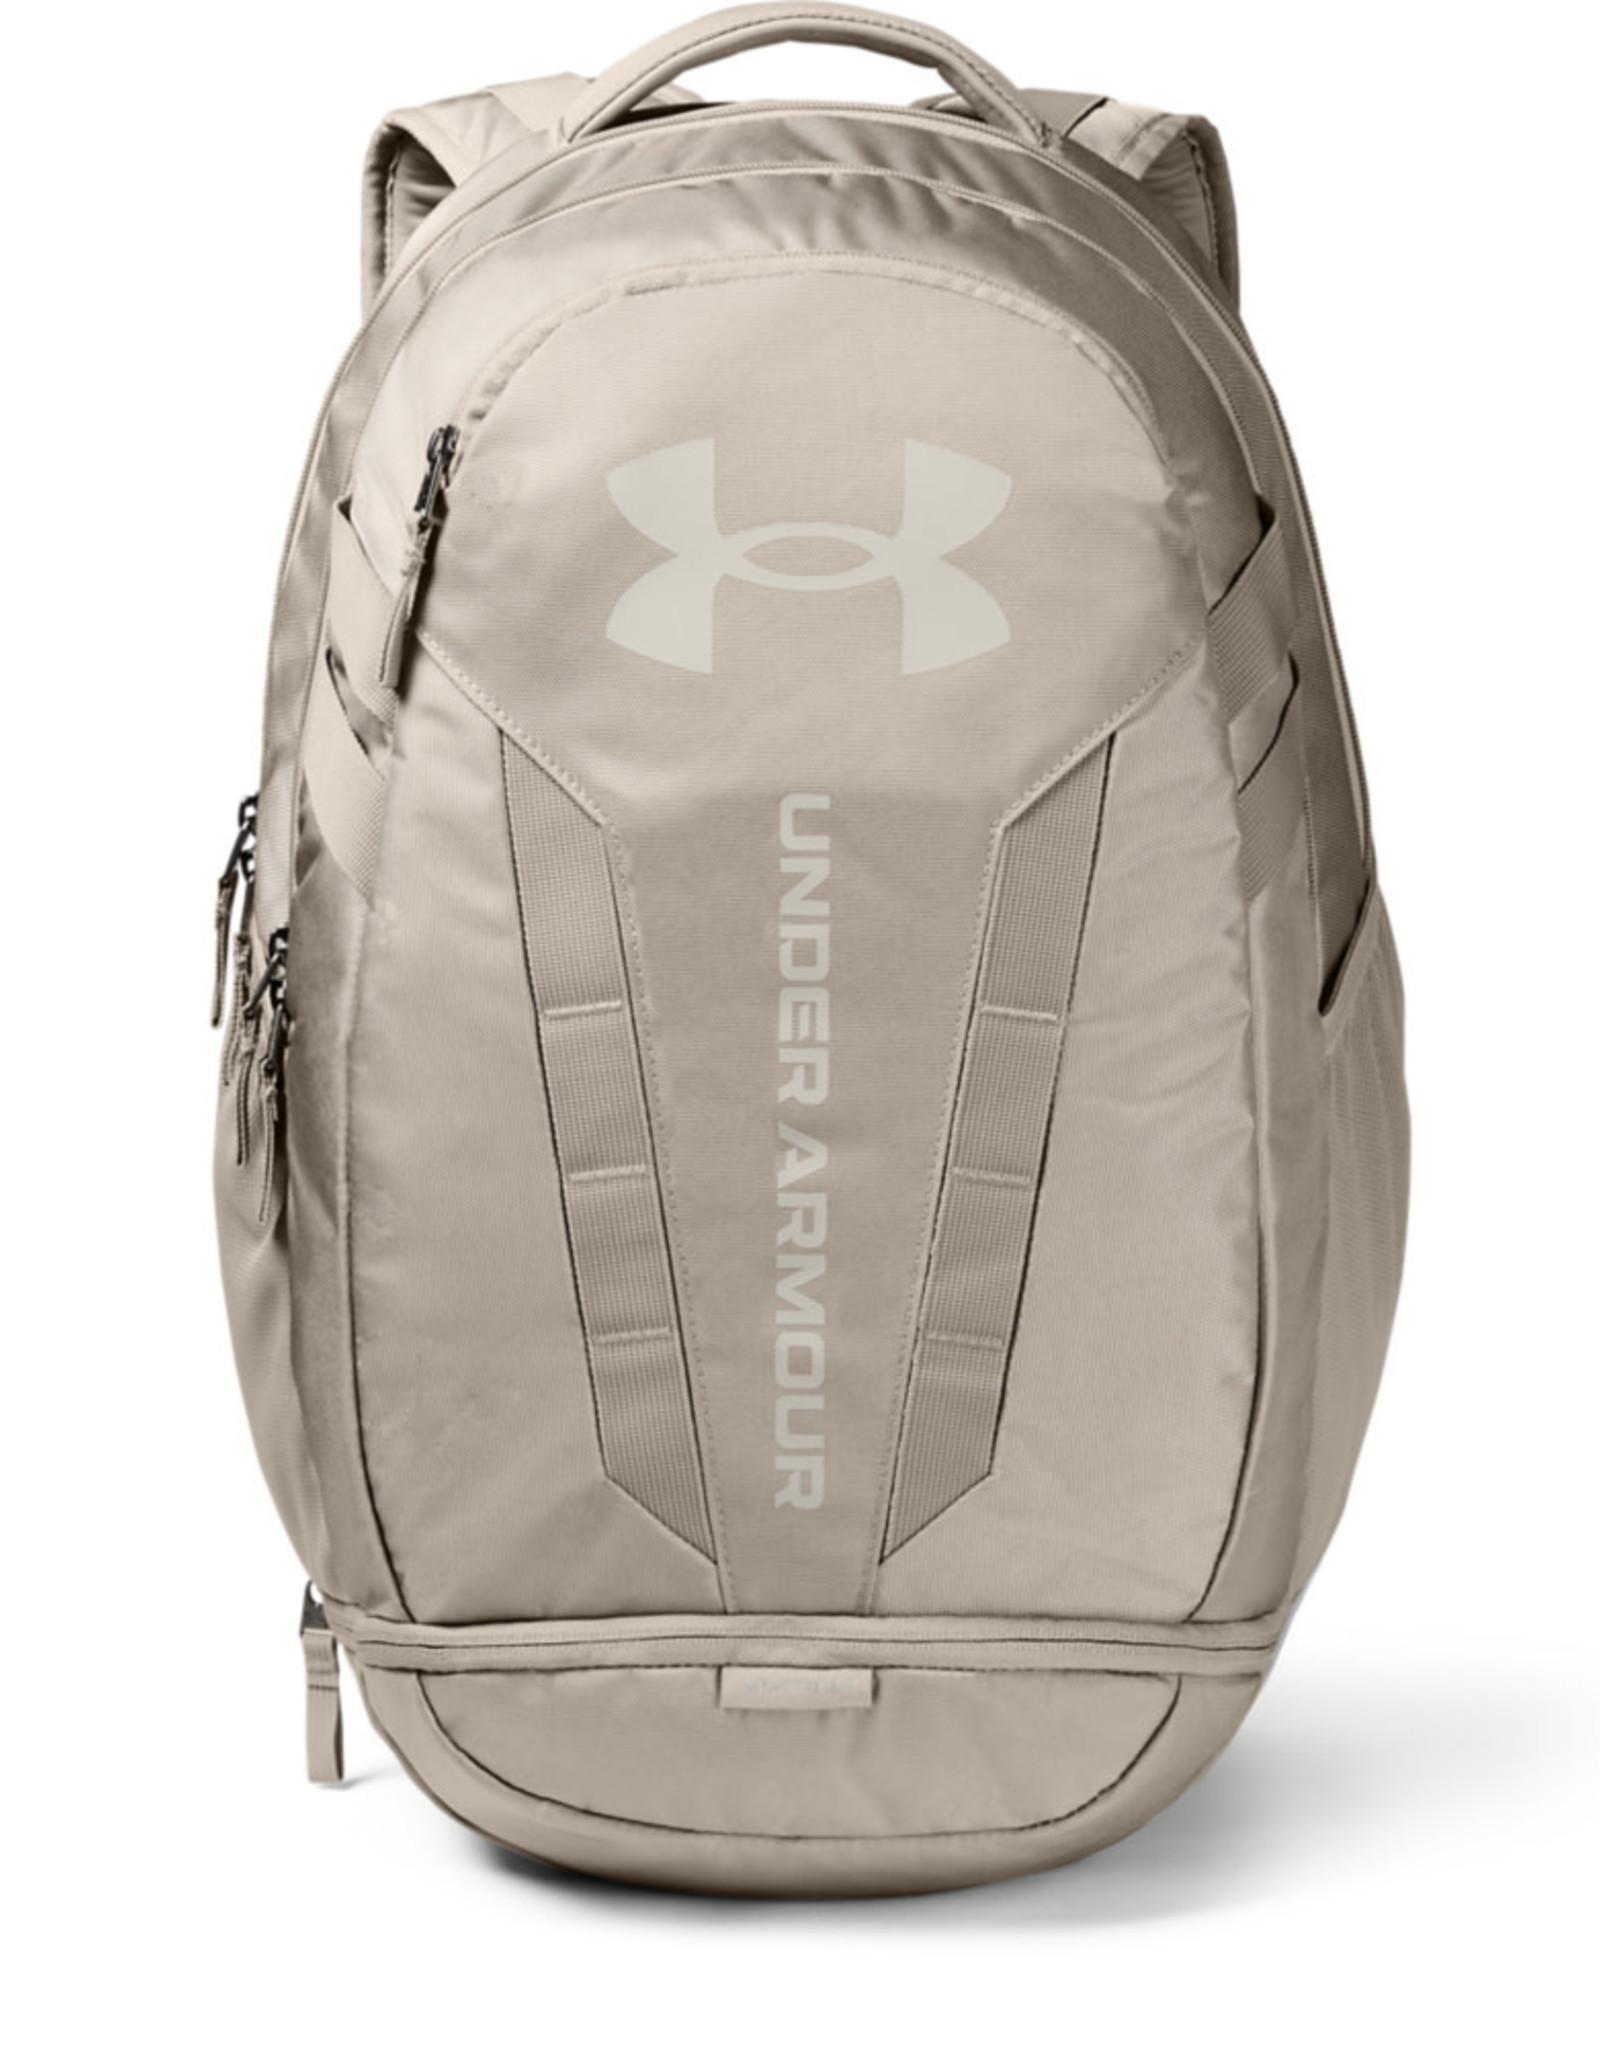 Under Armour UA Hustle 5.0 Backpack - HIGHLAND BUFF-HIGHLAND BUFF-Summit White - OSFA